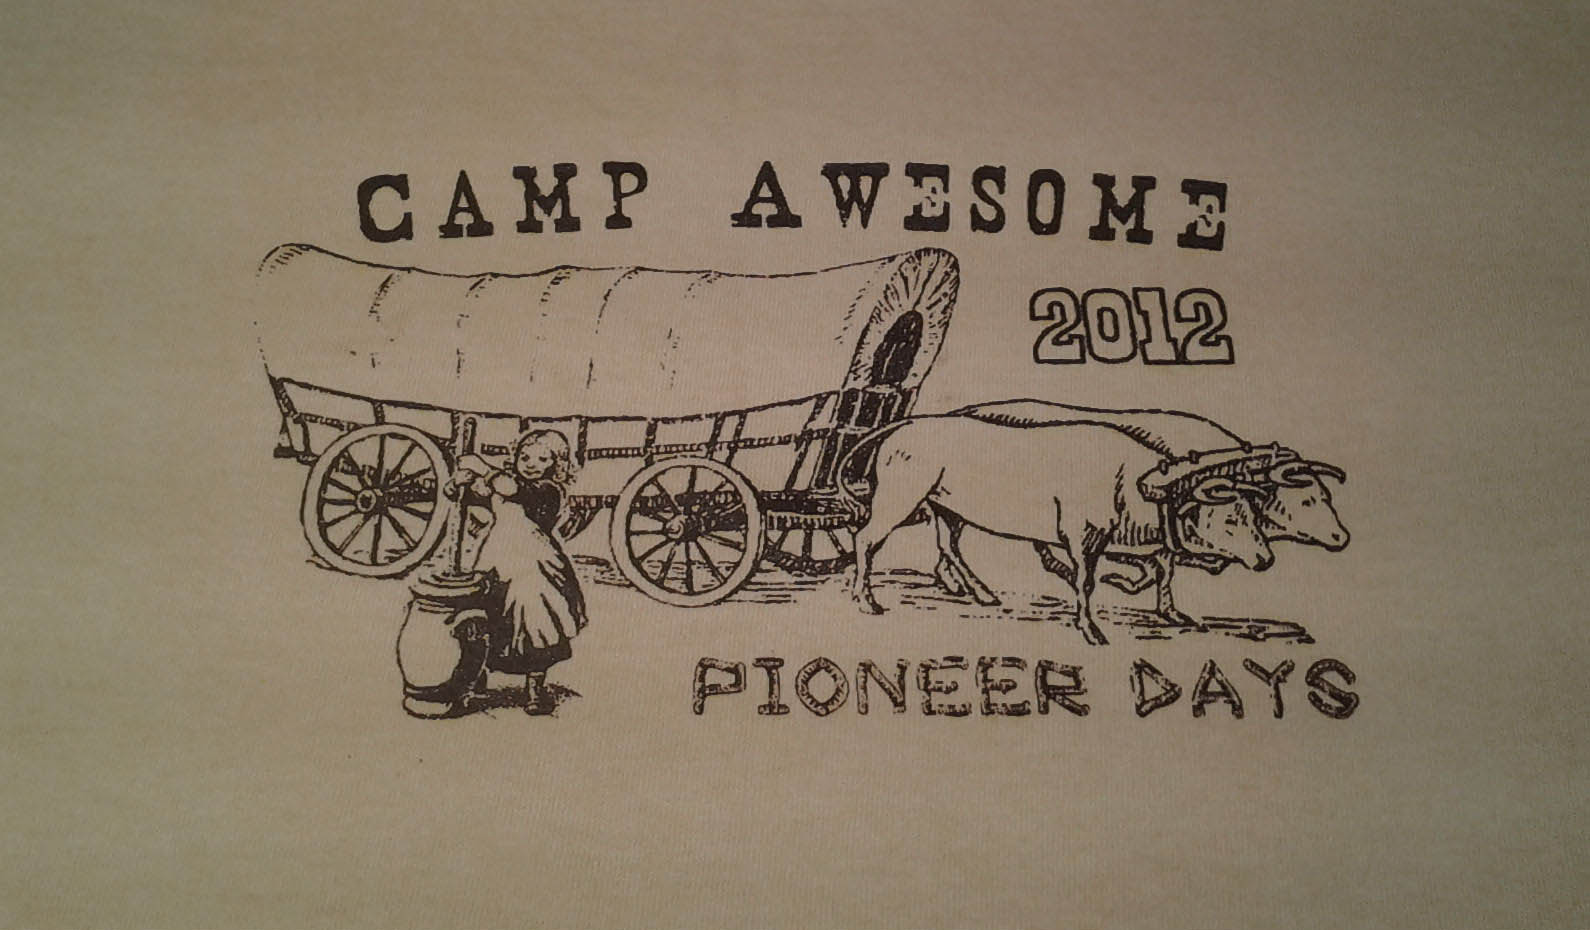 Camp Awesome Silkscreened T-Shirts